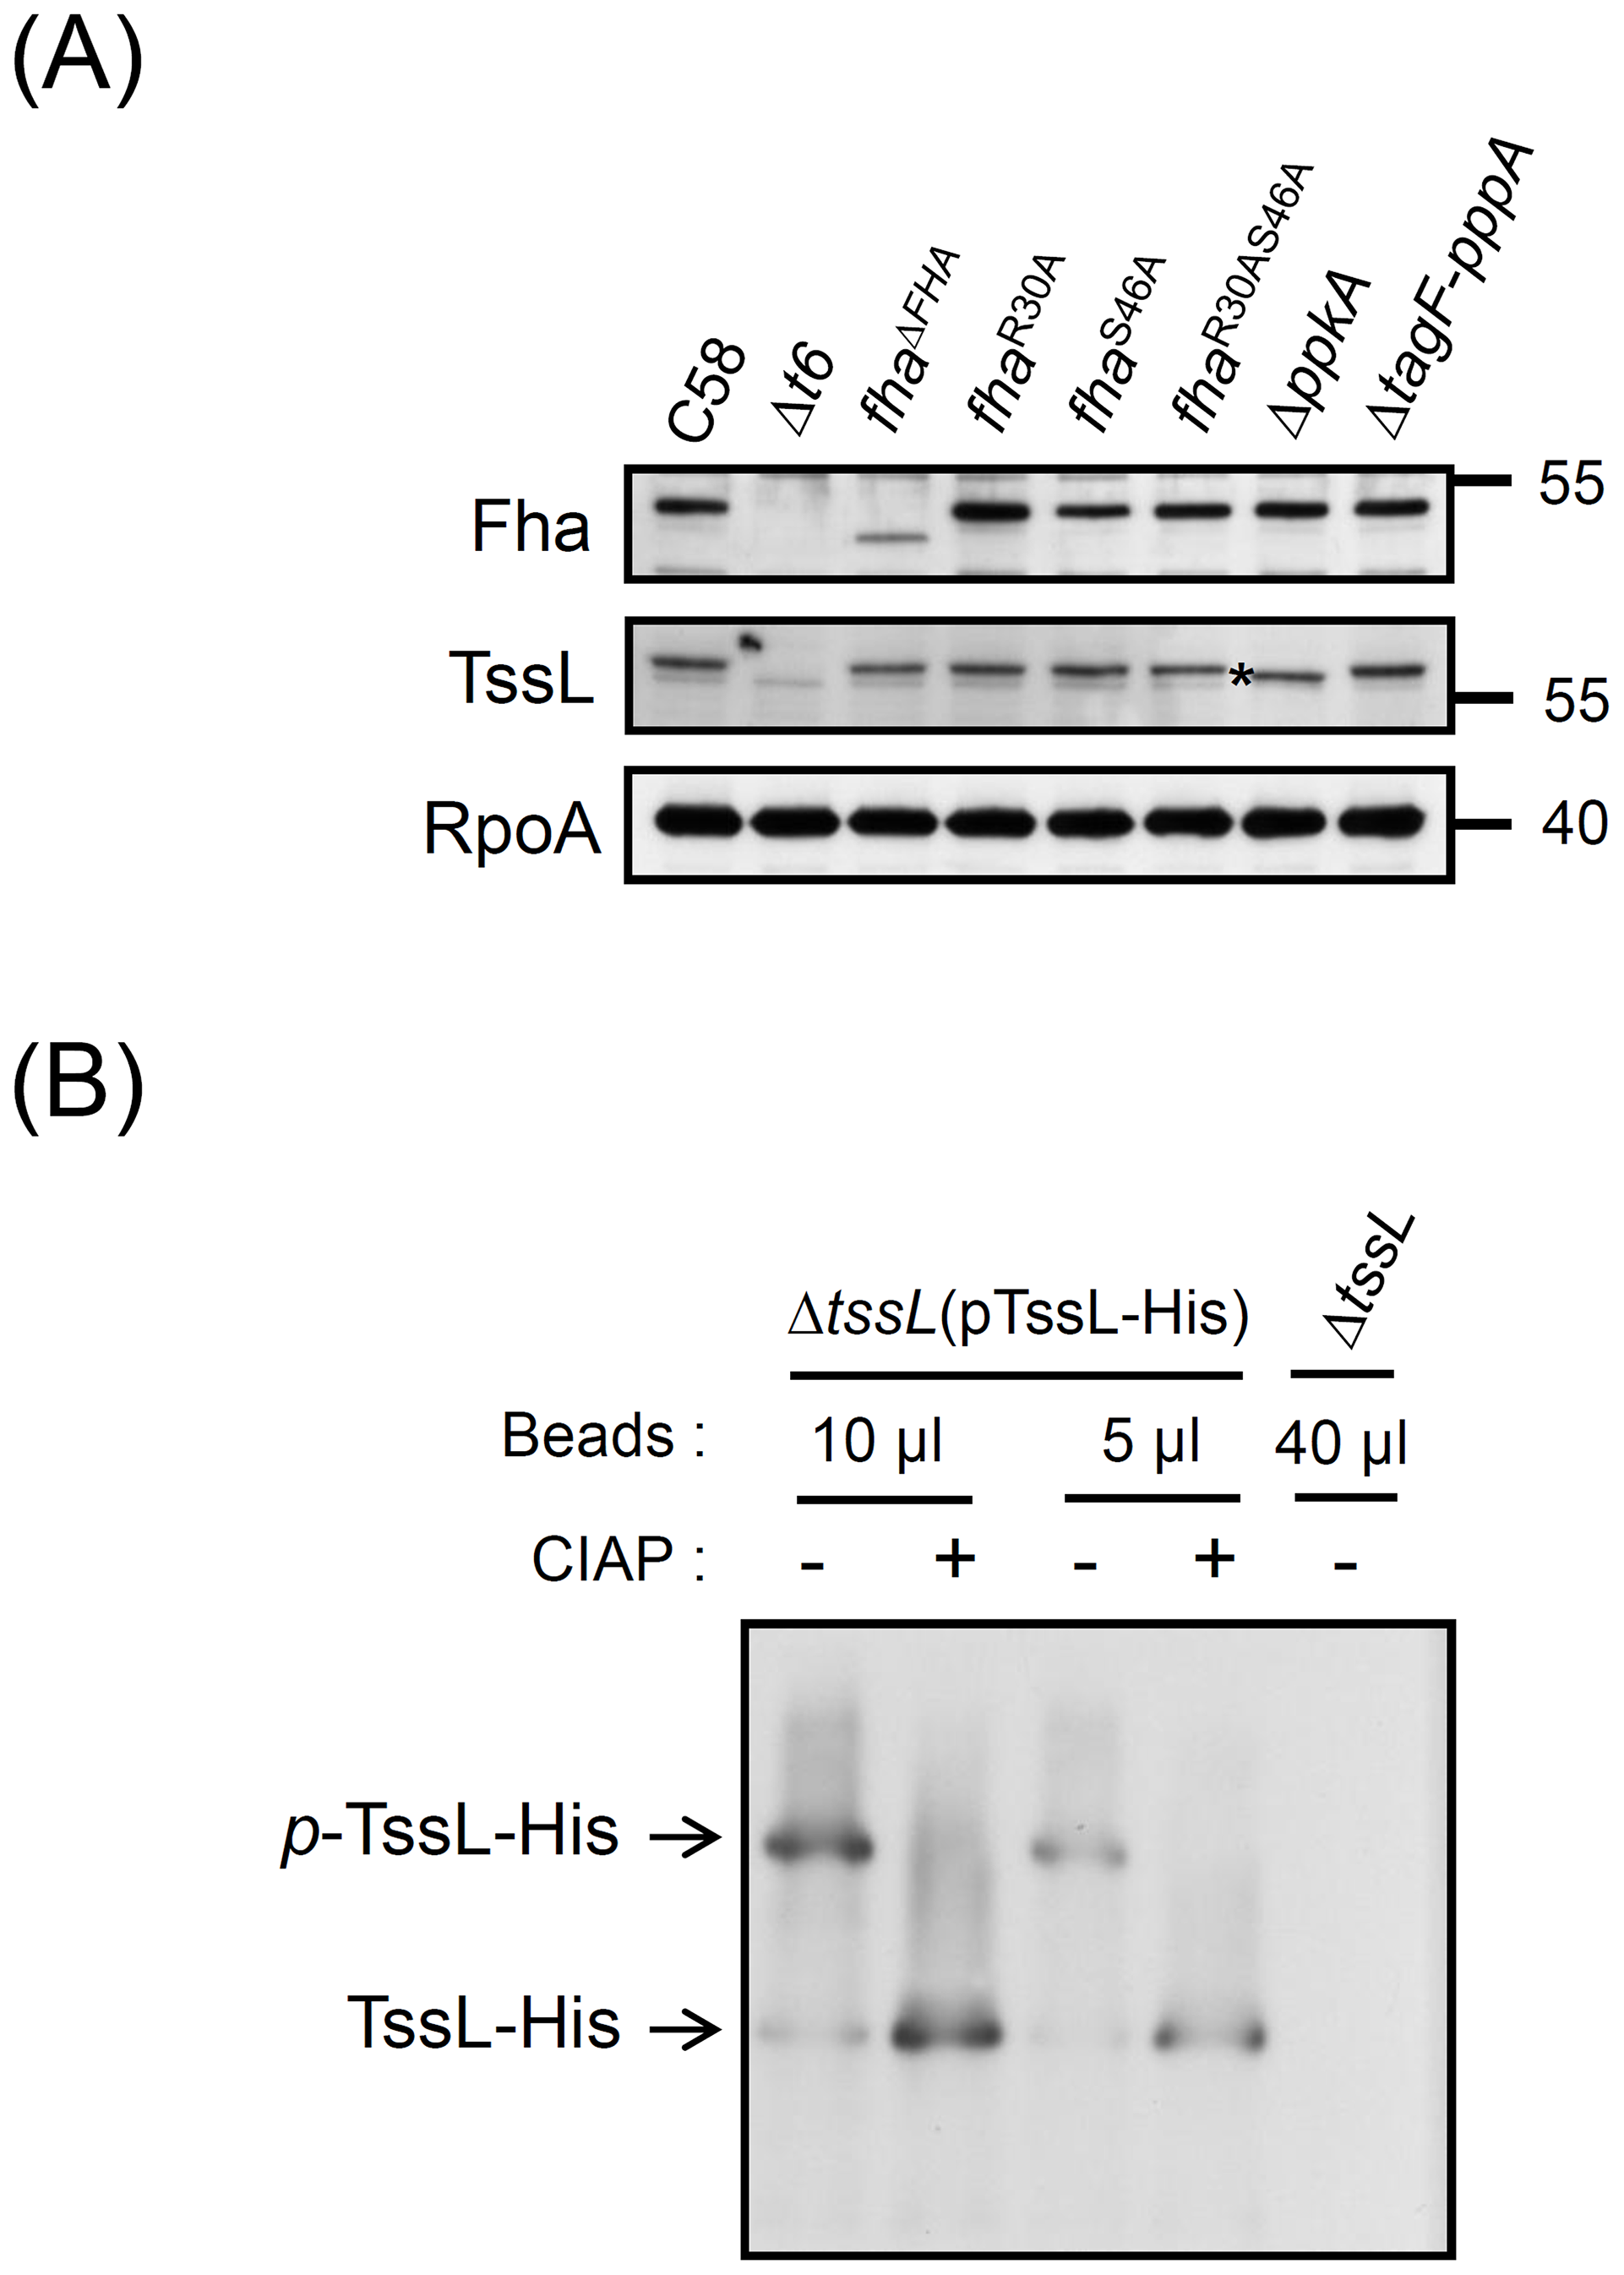 TssL phosphorylation analysis by Phos-tag.